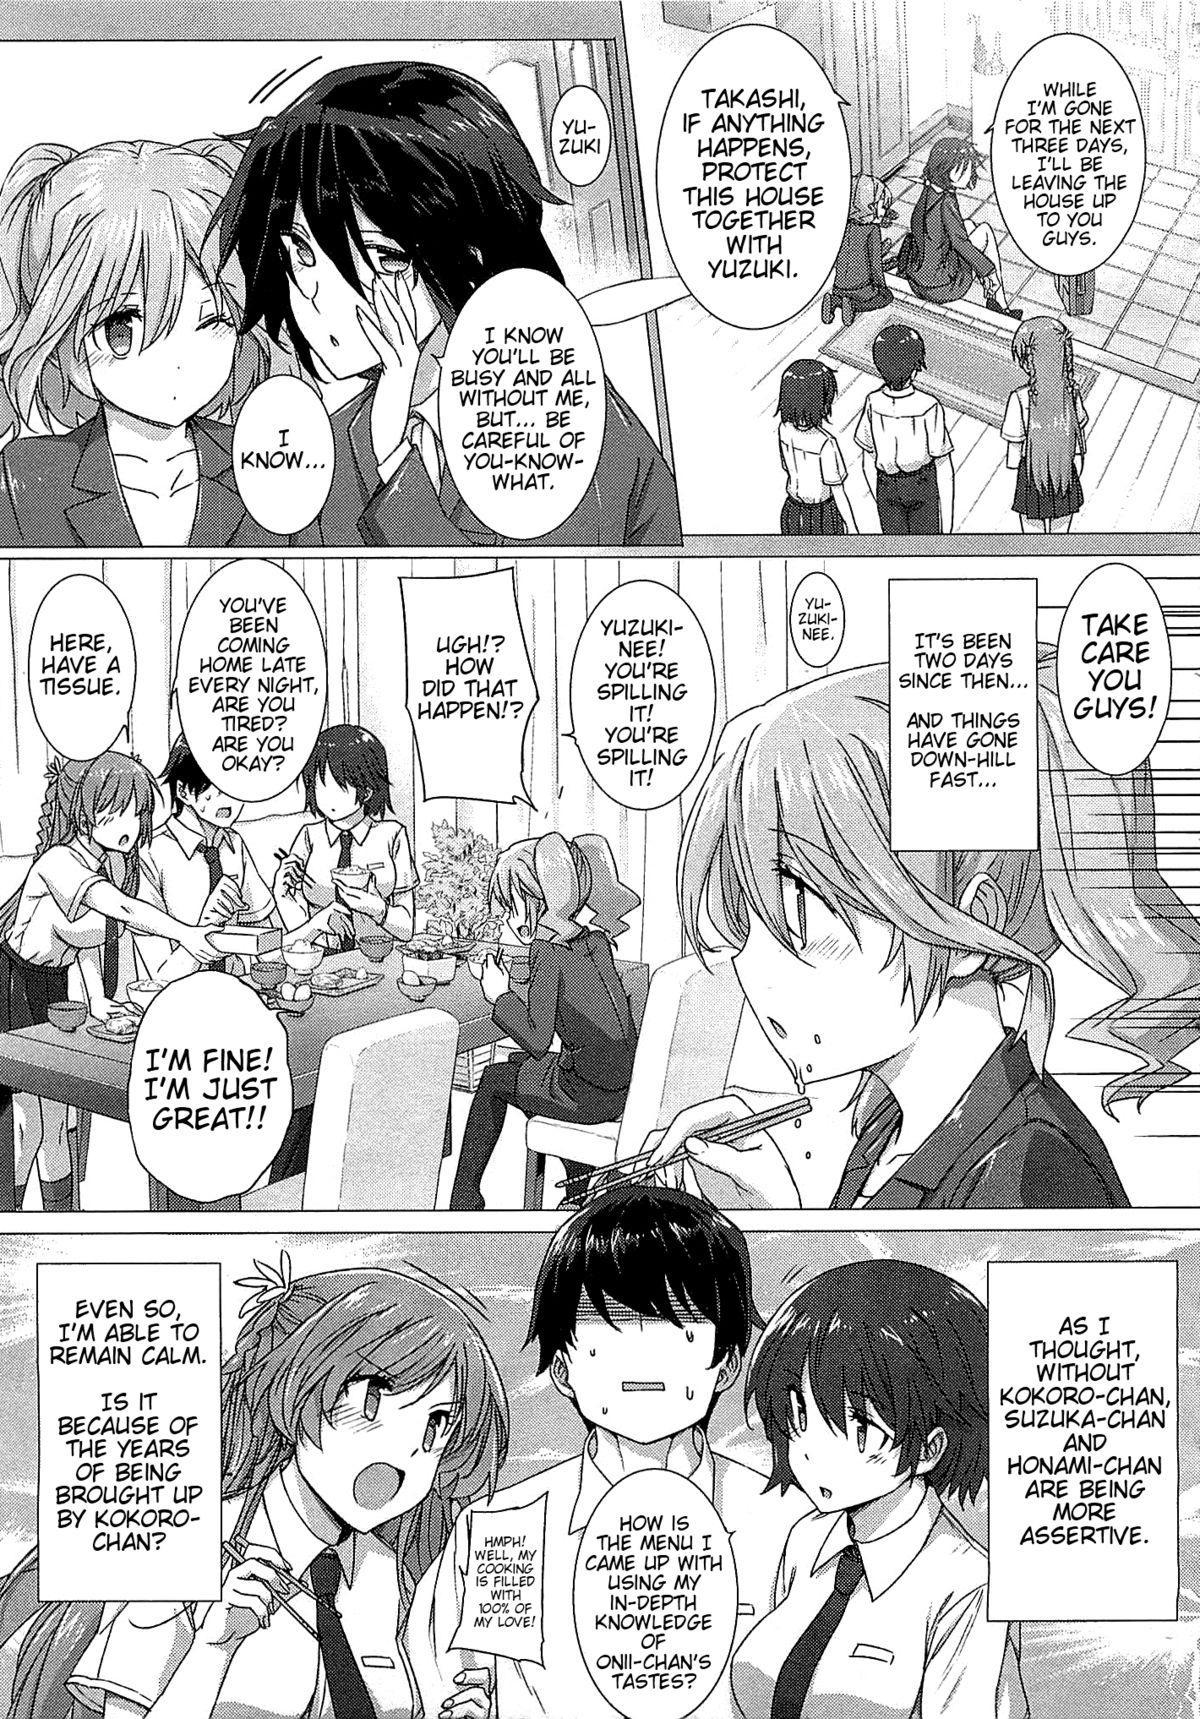 [Katsurai Yoshiaki] Kanojo wa Kazoku de Koibito de Ch. 1-3   She's My Family And My Lover Ch. 1-3 [English] {doujin-moe.us} 62